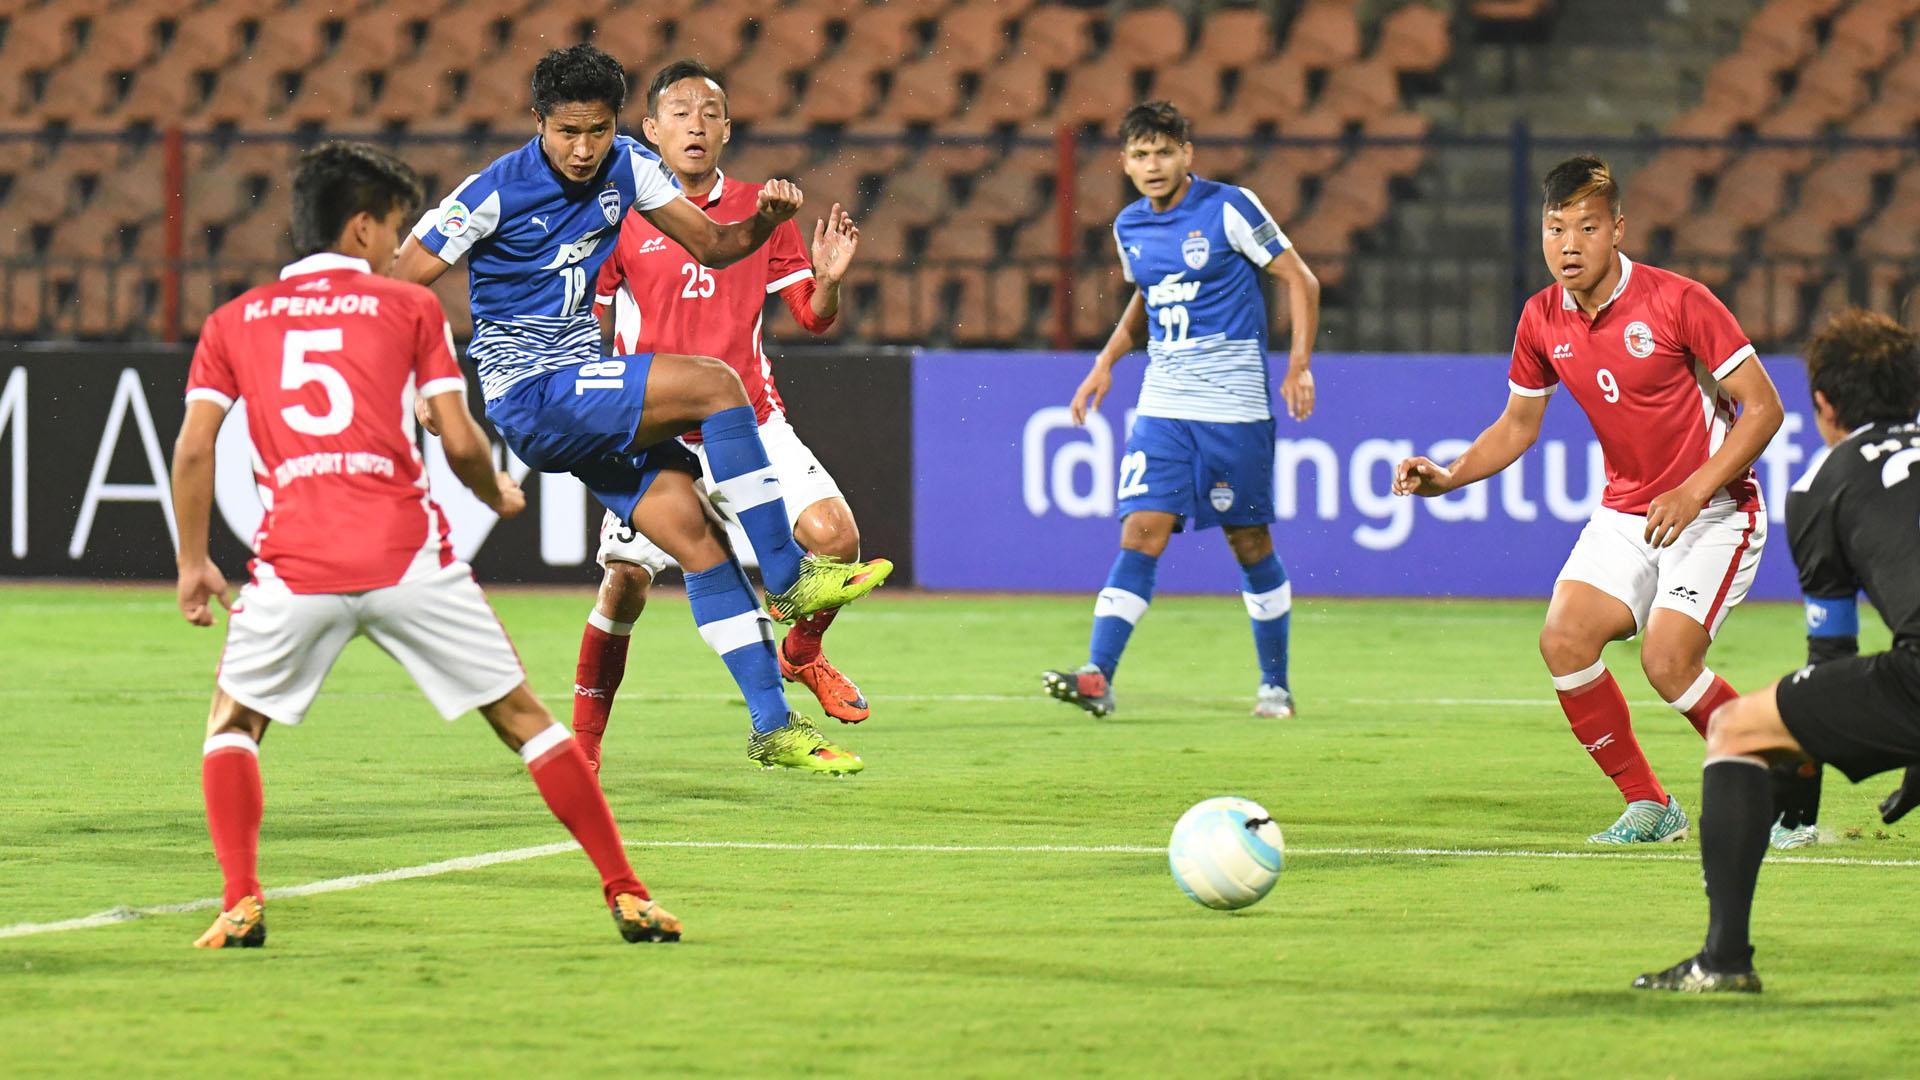 Thongkhosiem Haokip Bengaluru FC Transport United AFC Cup Preliminary Round 2018